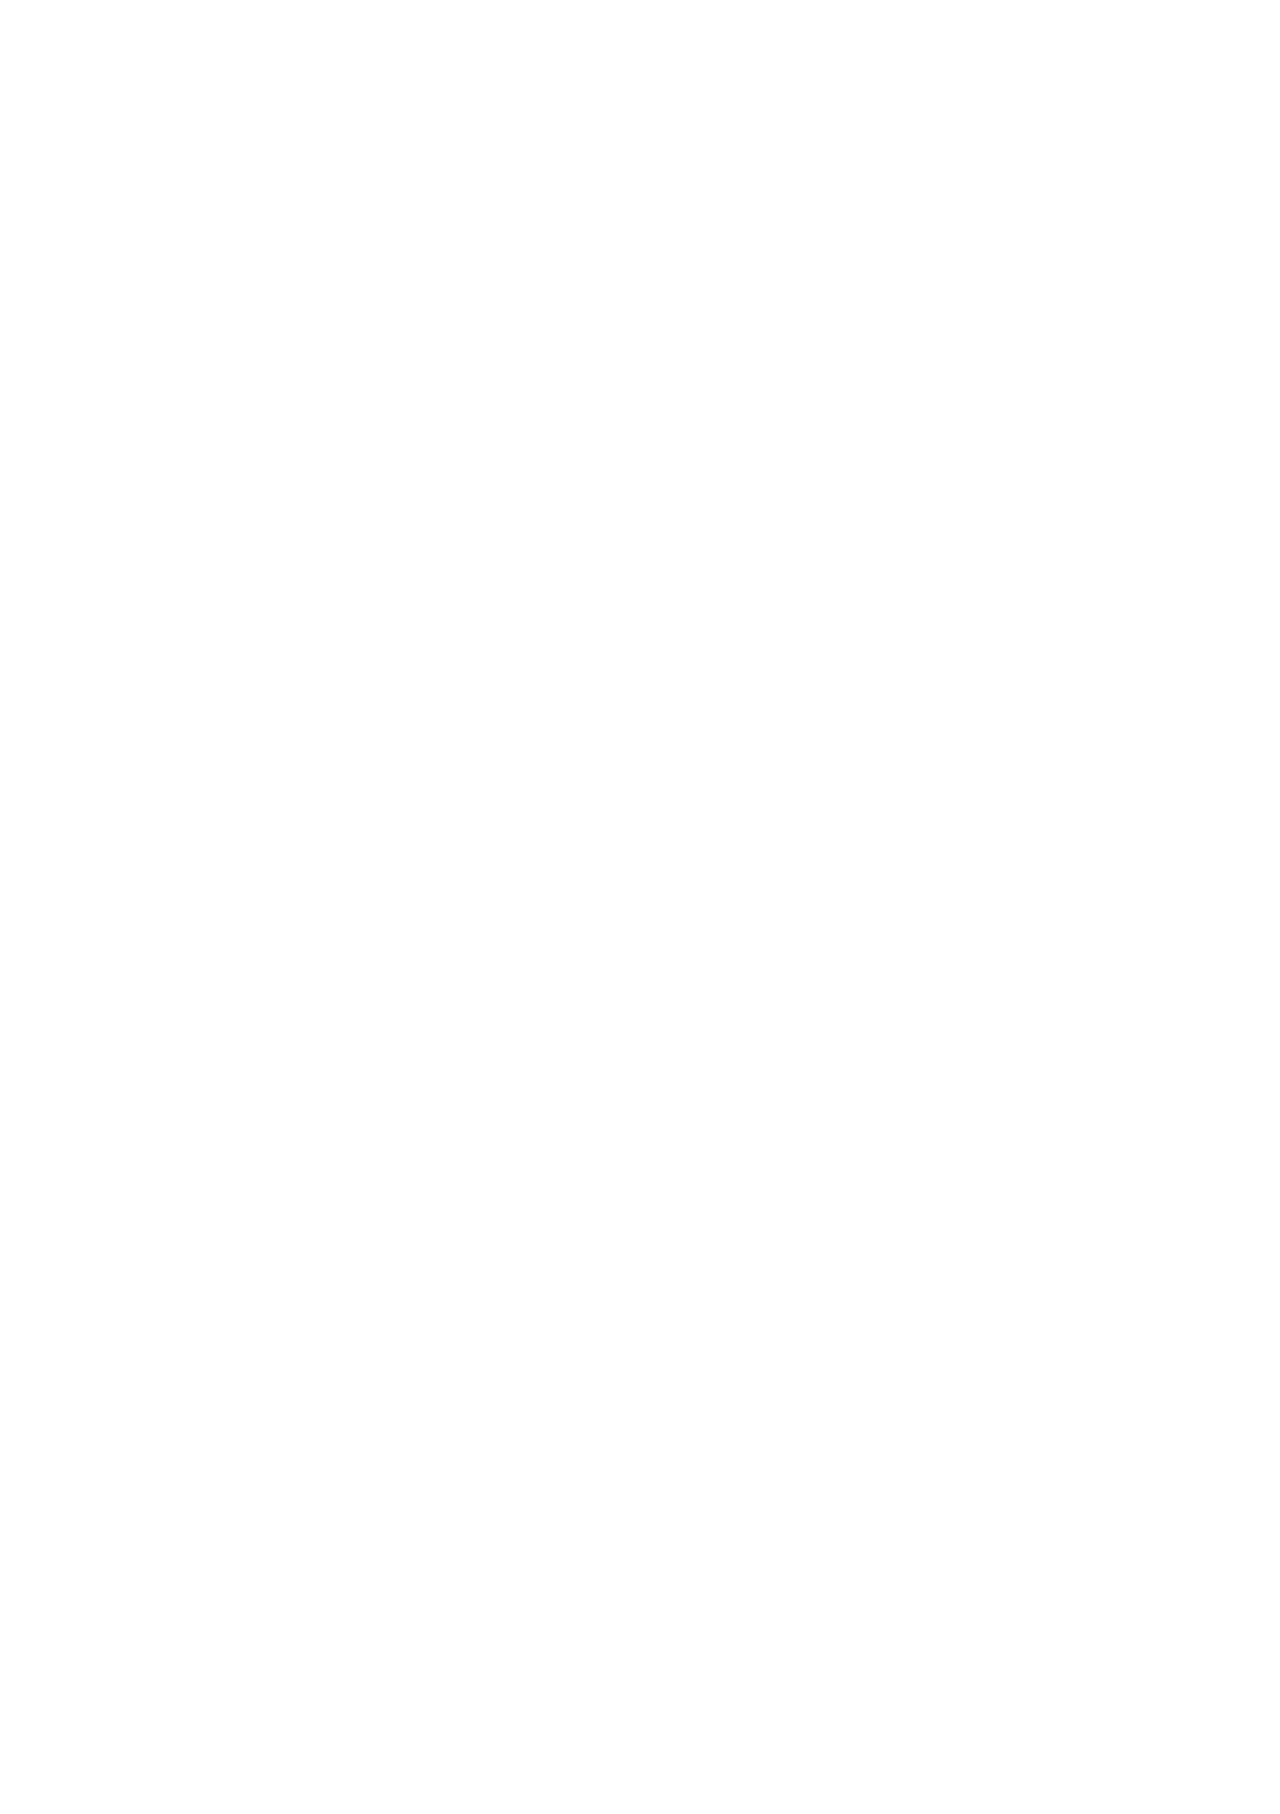 https://digital.tessmann.it/mediaArchive/media/image/Page/DS/1954/23_04_1954/DS_1954_04_23_7_object_2574525.png?auth=f535e1cb411630ee9c2f3e1ad966d272